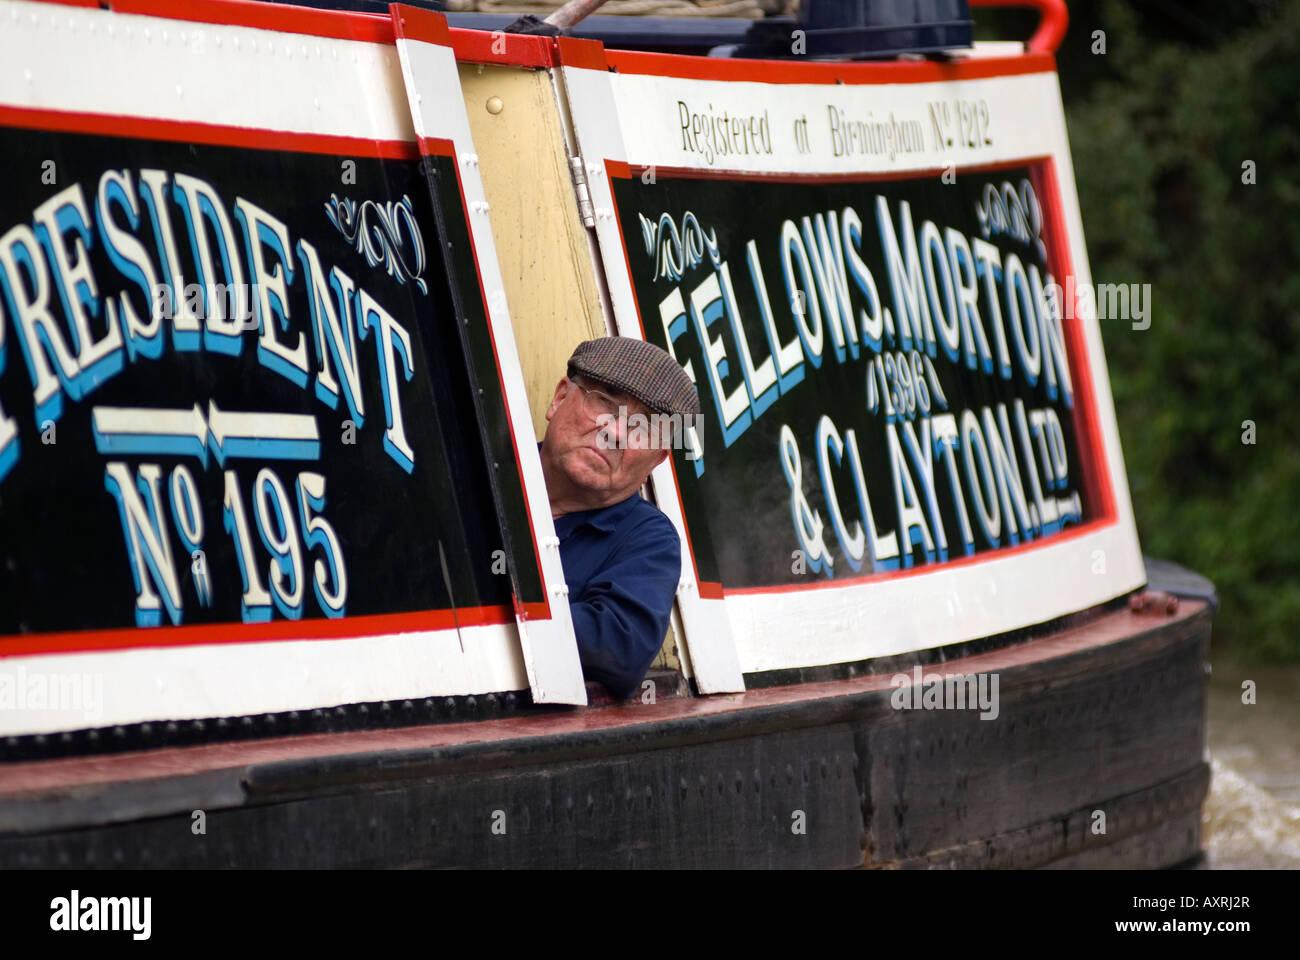 Steam powered narrowboat President on the canal, historic Fellows, Morton & Clayton Ltd. No. 195 Stock Photo